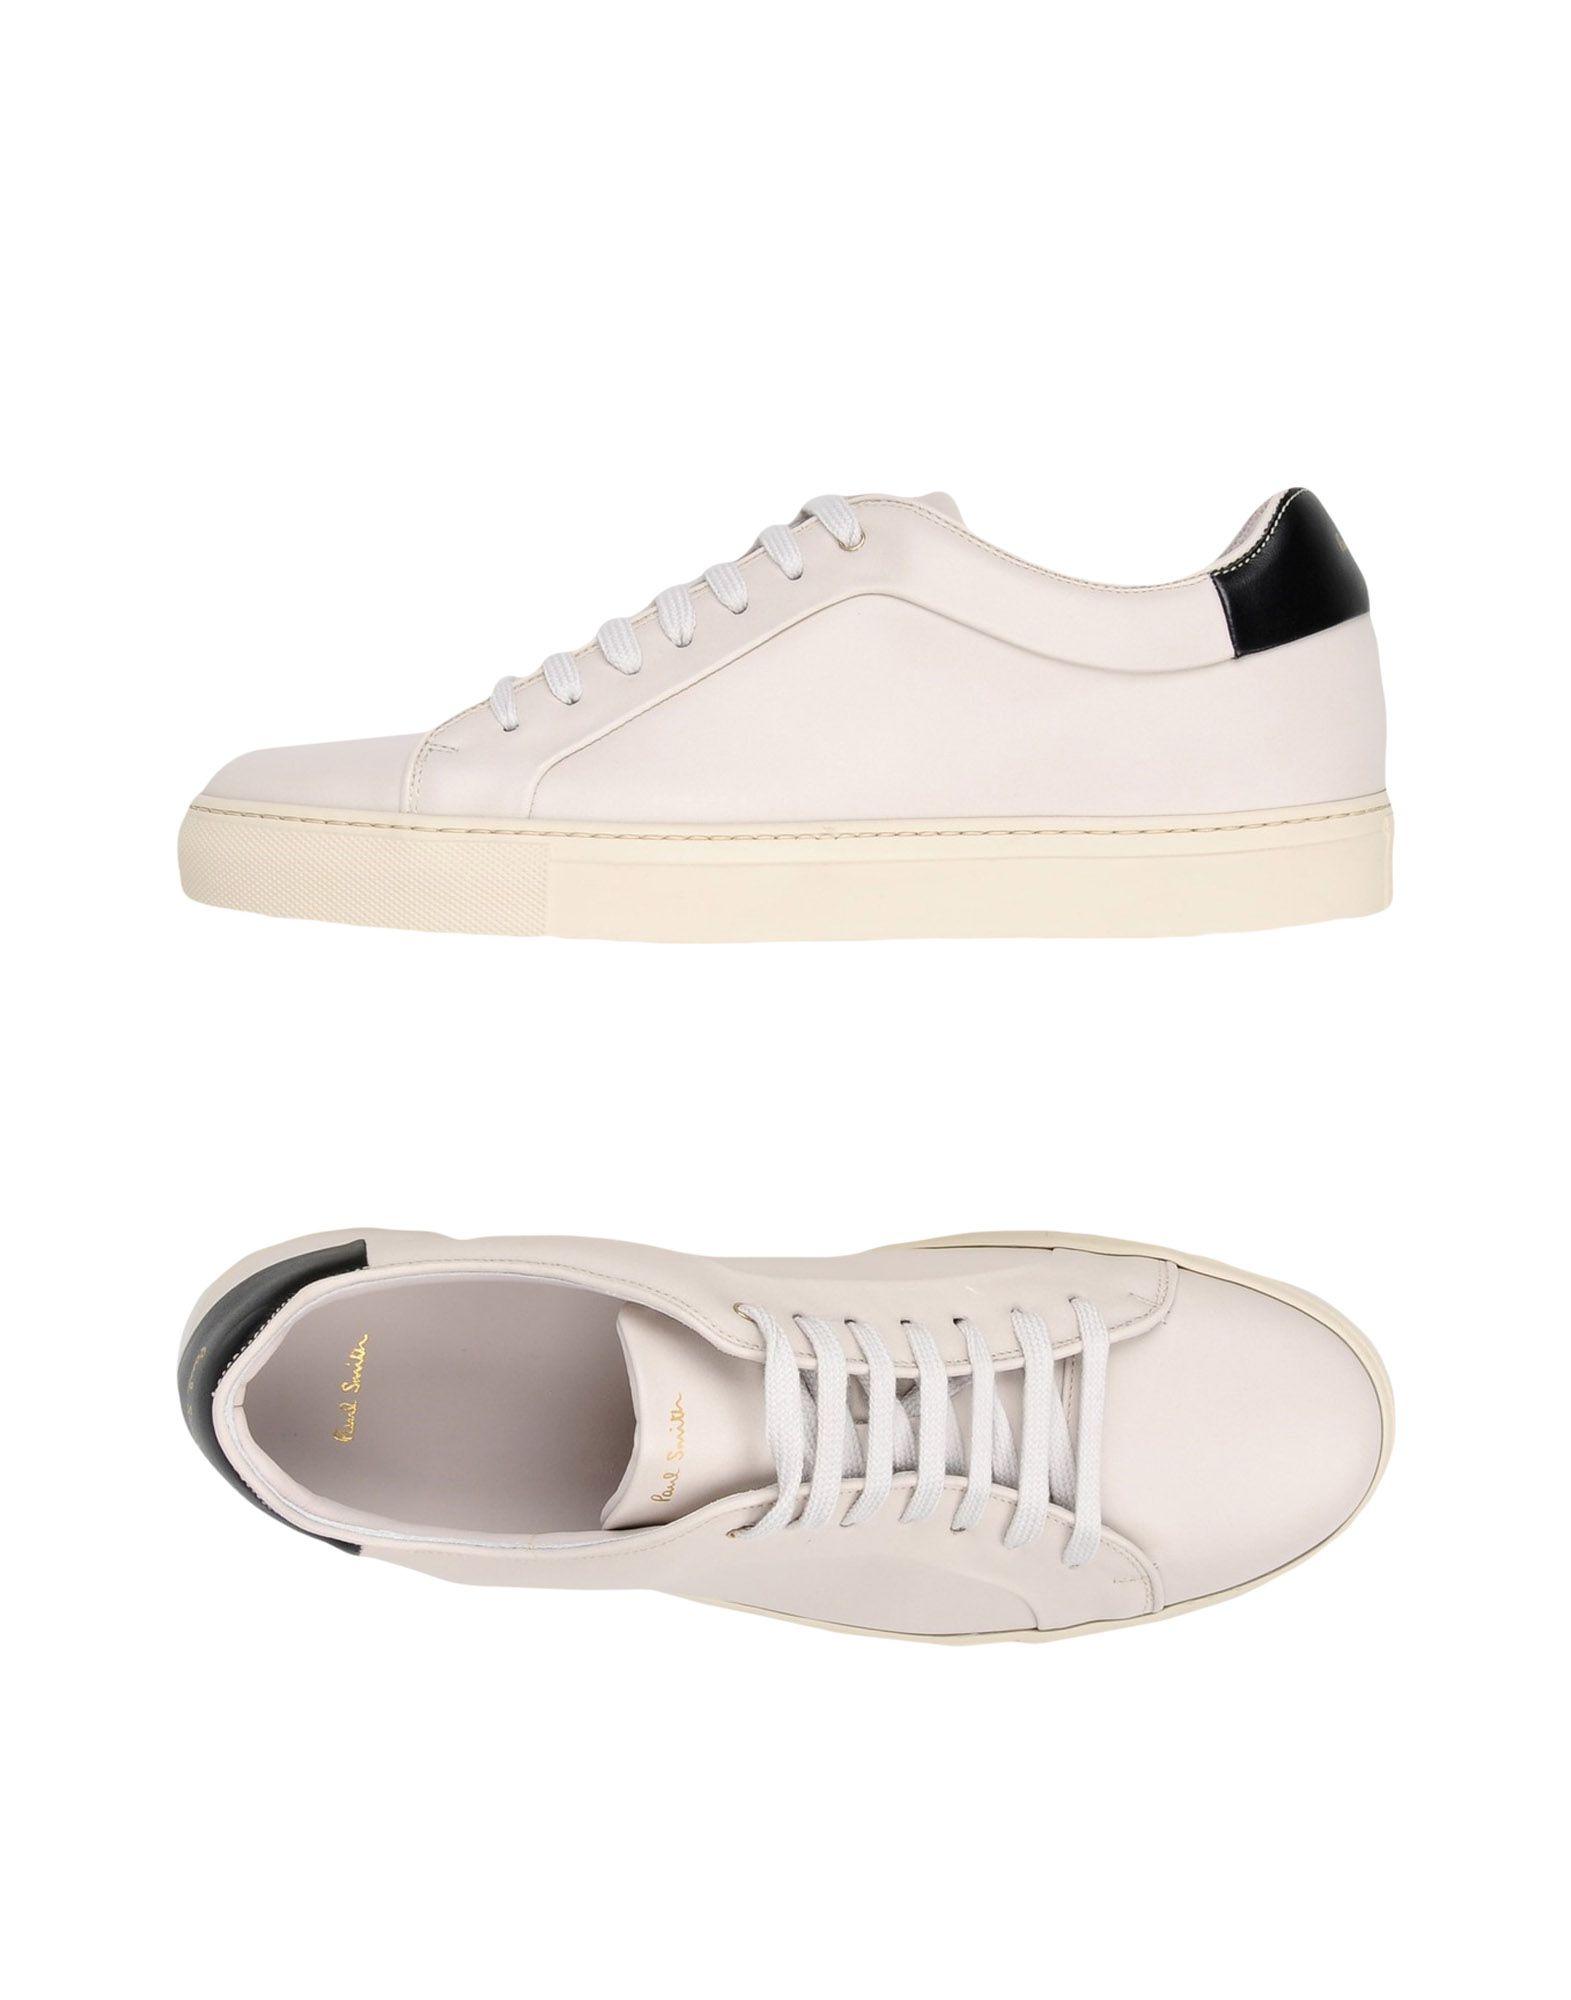 Paul Smith Mens Shoe Basso Quiet  11312125NL Gute Qualität beliebte Schuhe